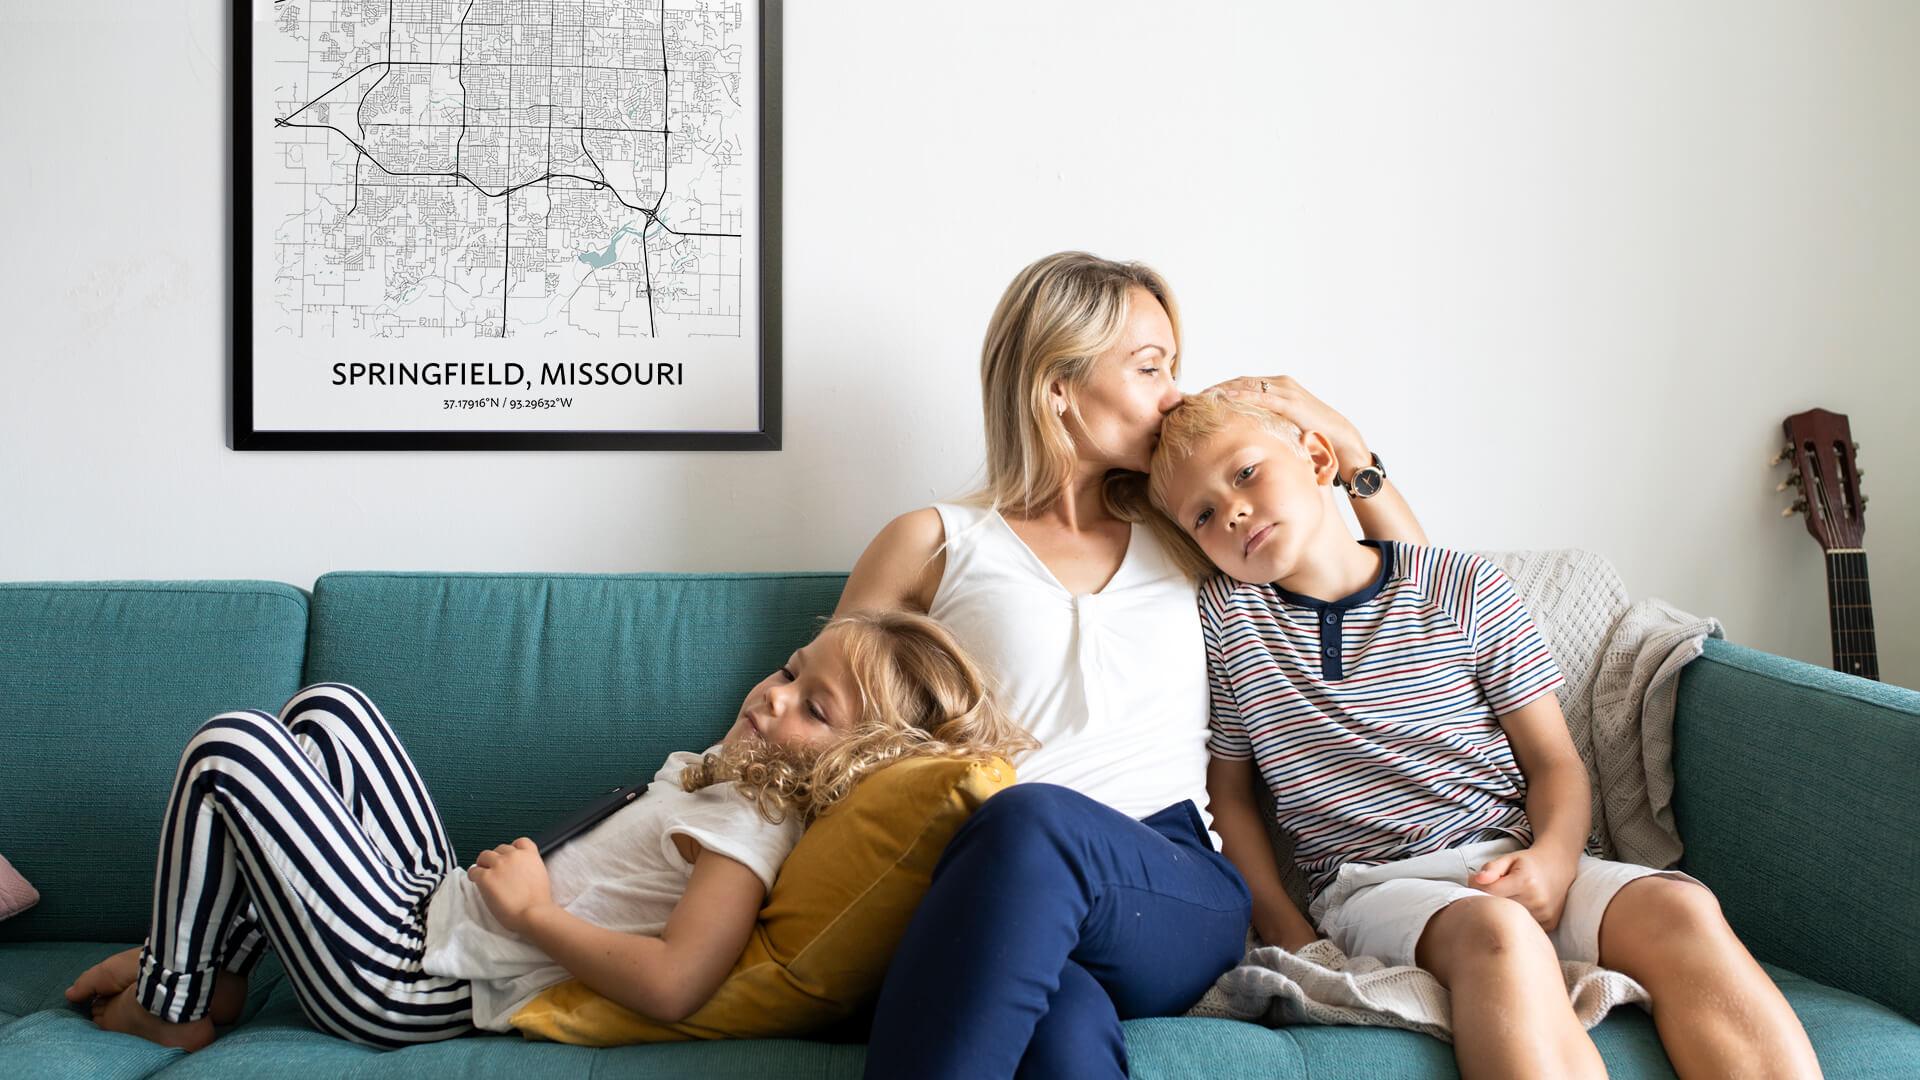 Springfield Missouri map poster